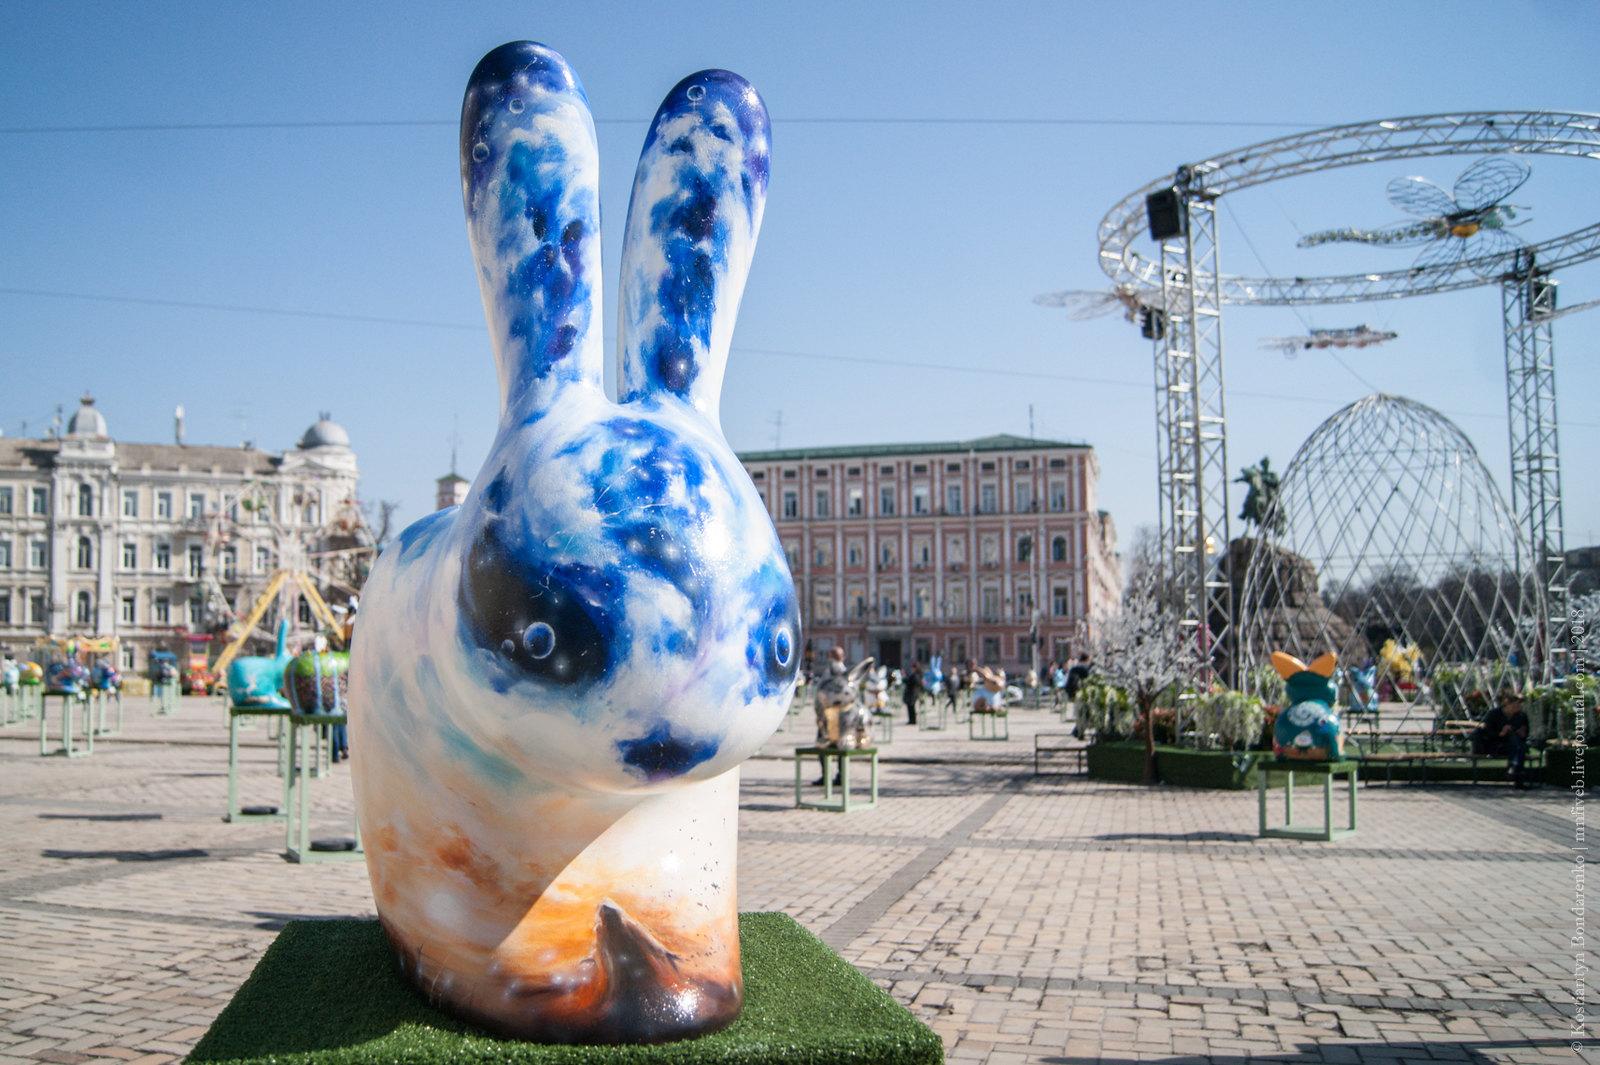 201804010 - Easter-09